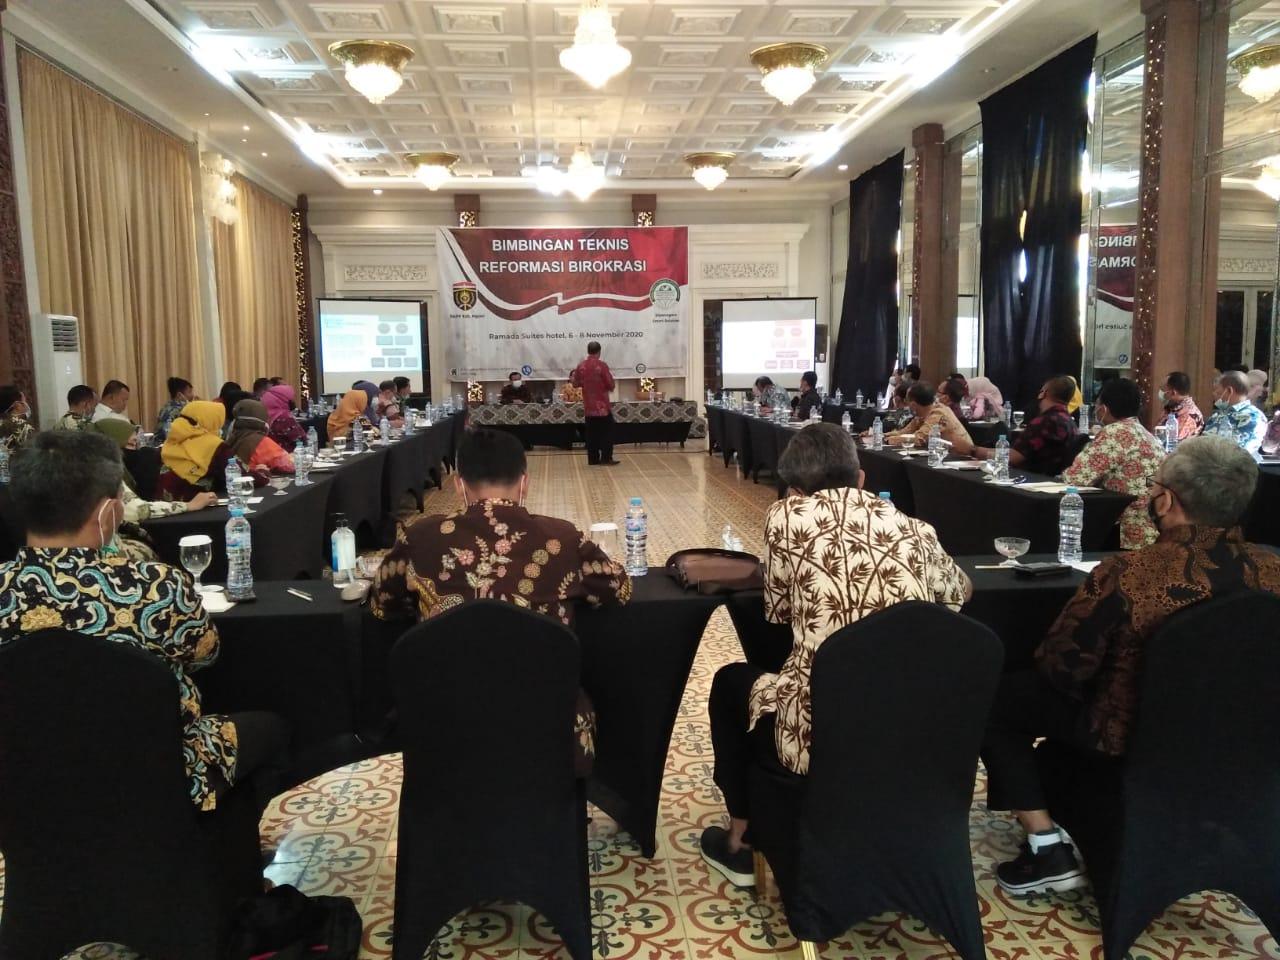 Bimbingan Teknis Reformasi Birokrasi di Ramada Suites Hotel Surakarta